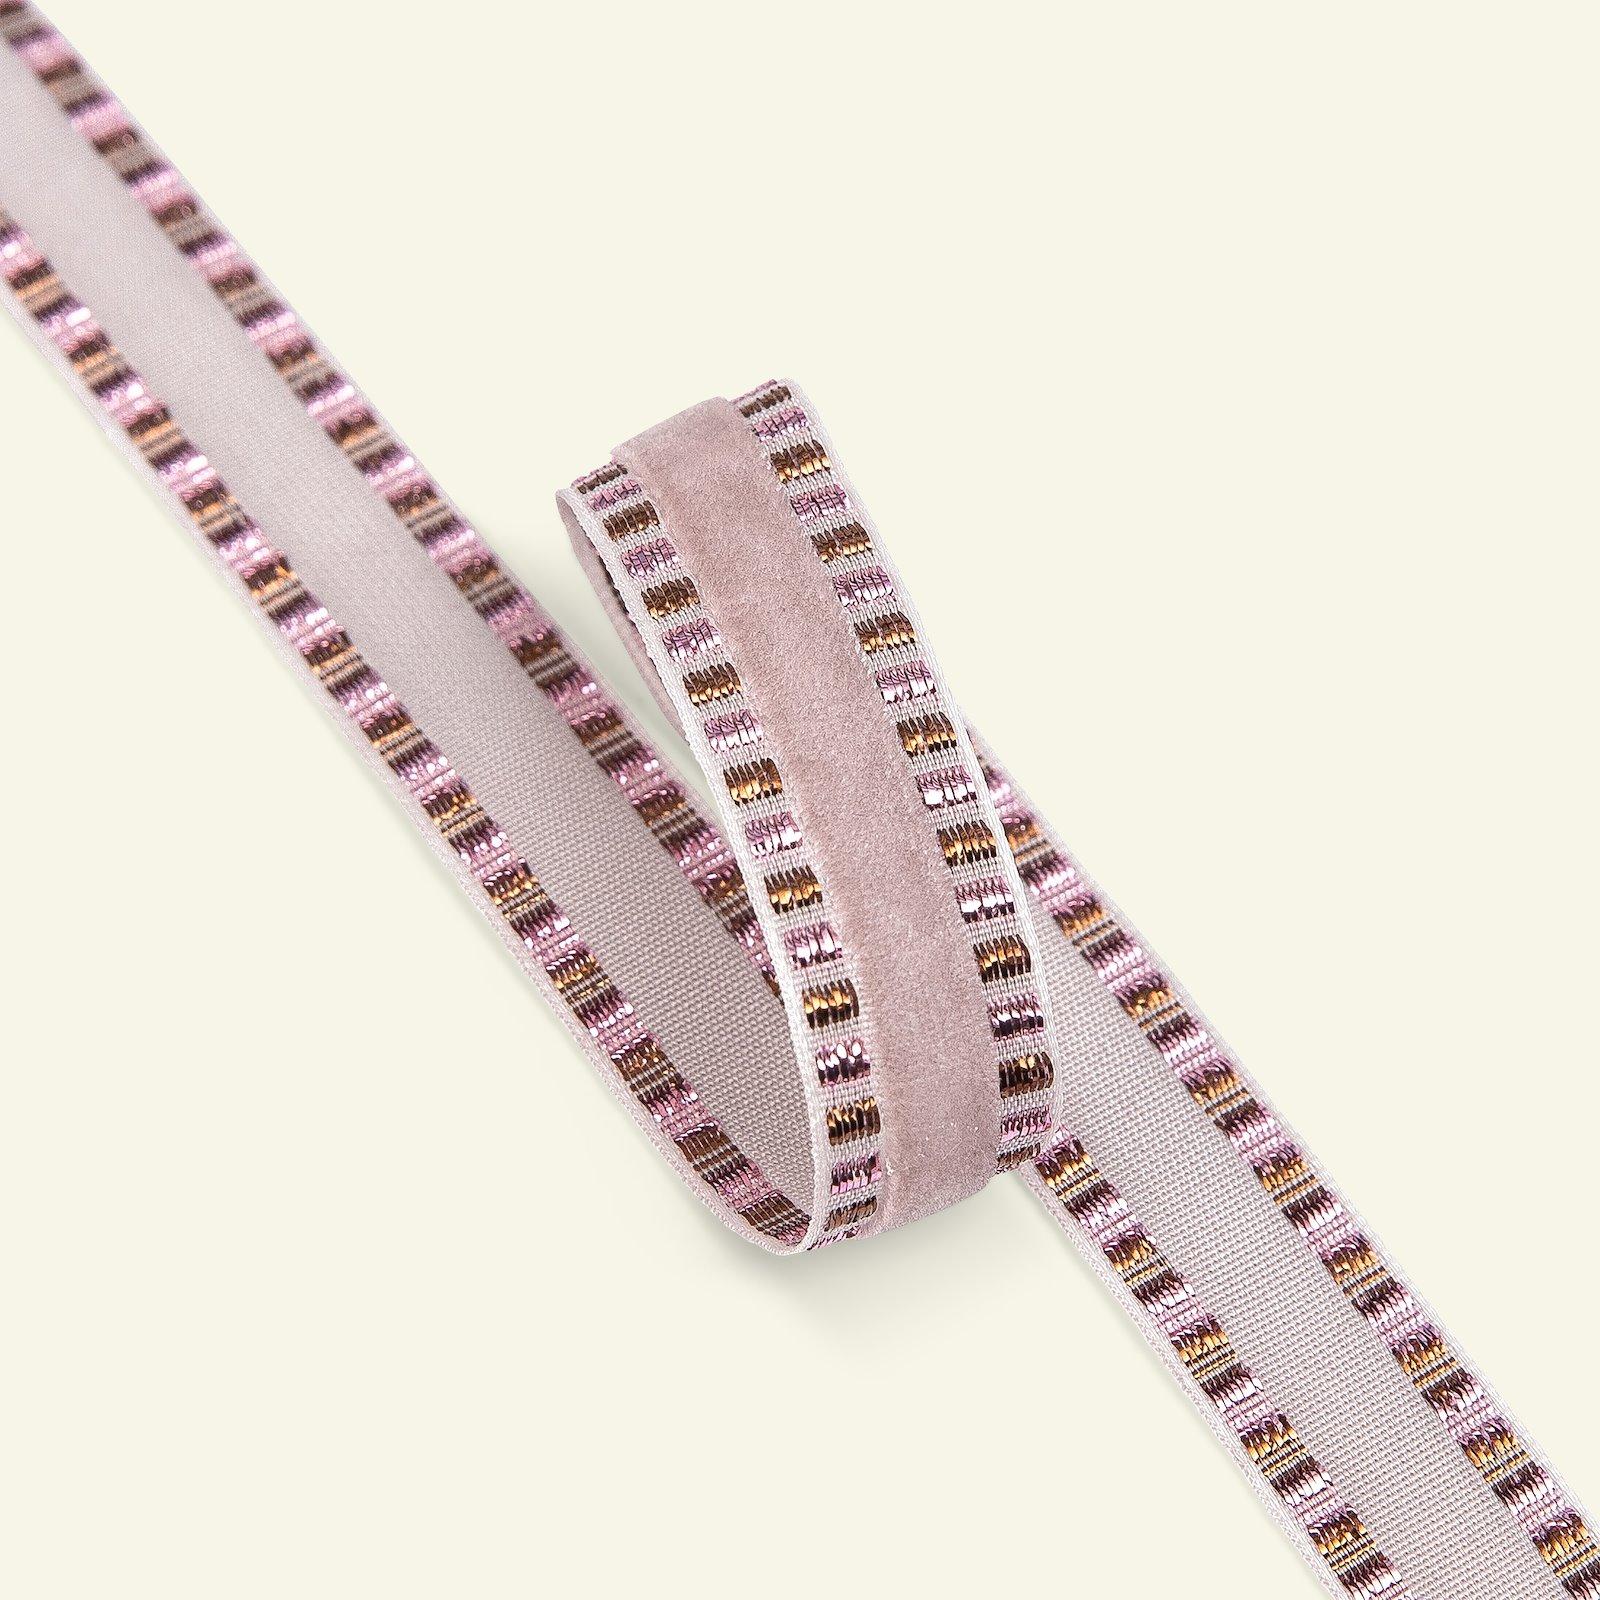 Velour ribbon 15mm ds. rose/gold lur. 3m 21383_pack